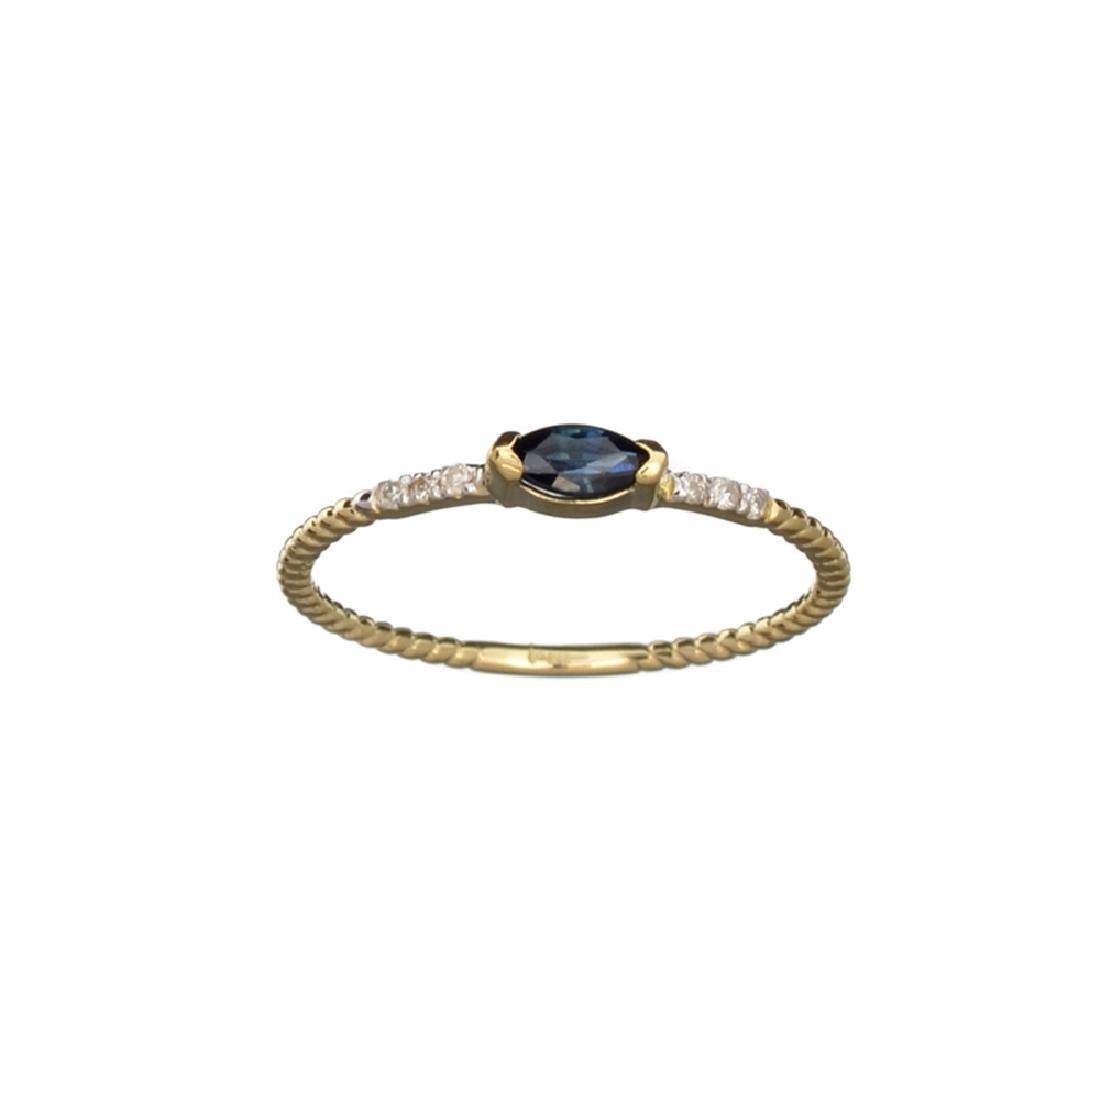 APP: 0.5k Fine Jewelry 14KT Gold, 0.20CT Blue Sapphire